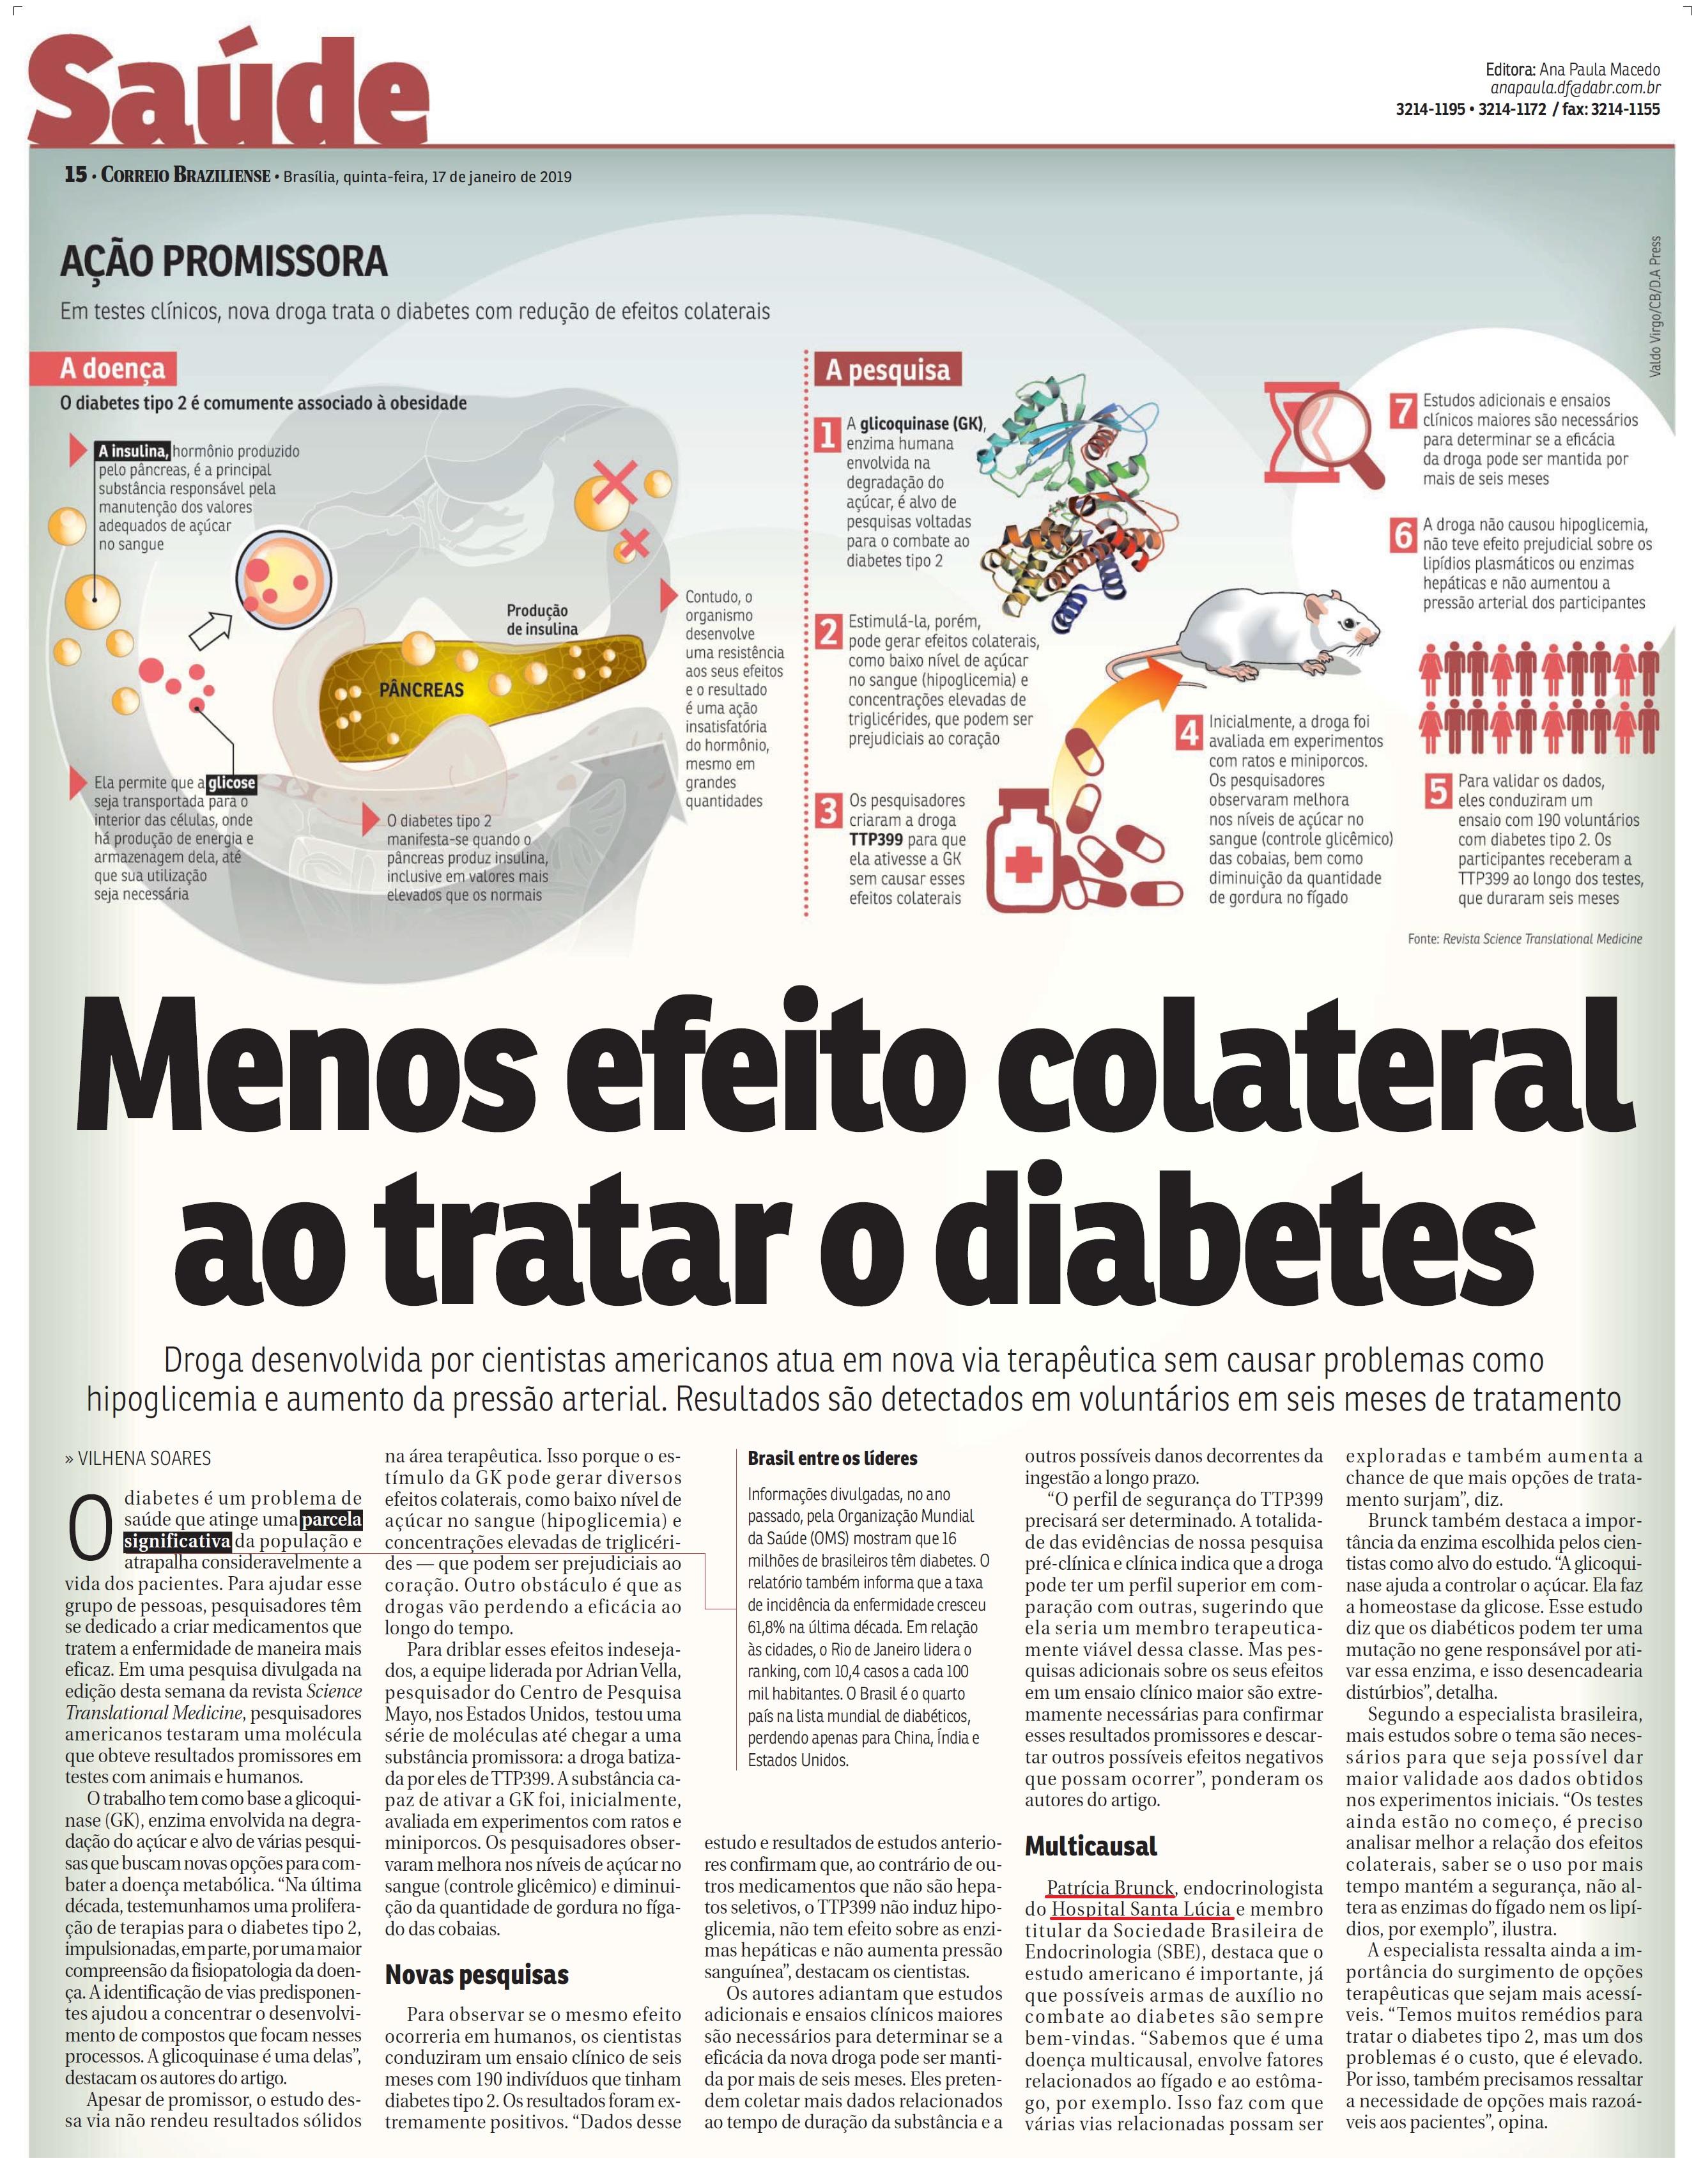 Correio Braziliense - Dra. Patrícia Brunck HSLS - 17-01-2019